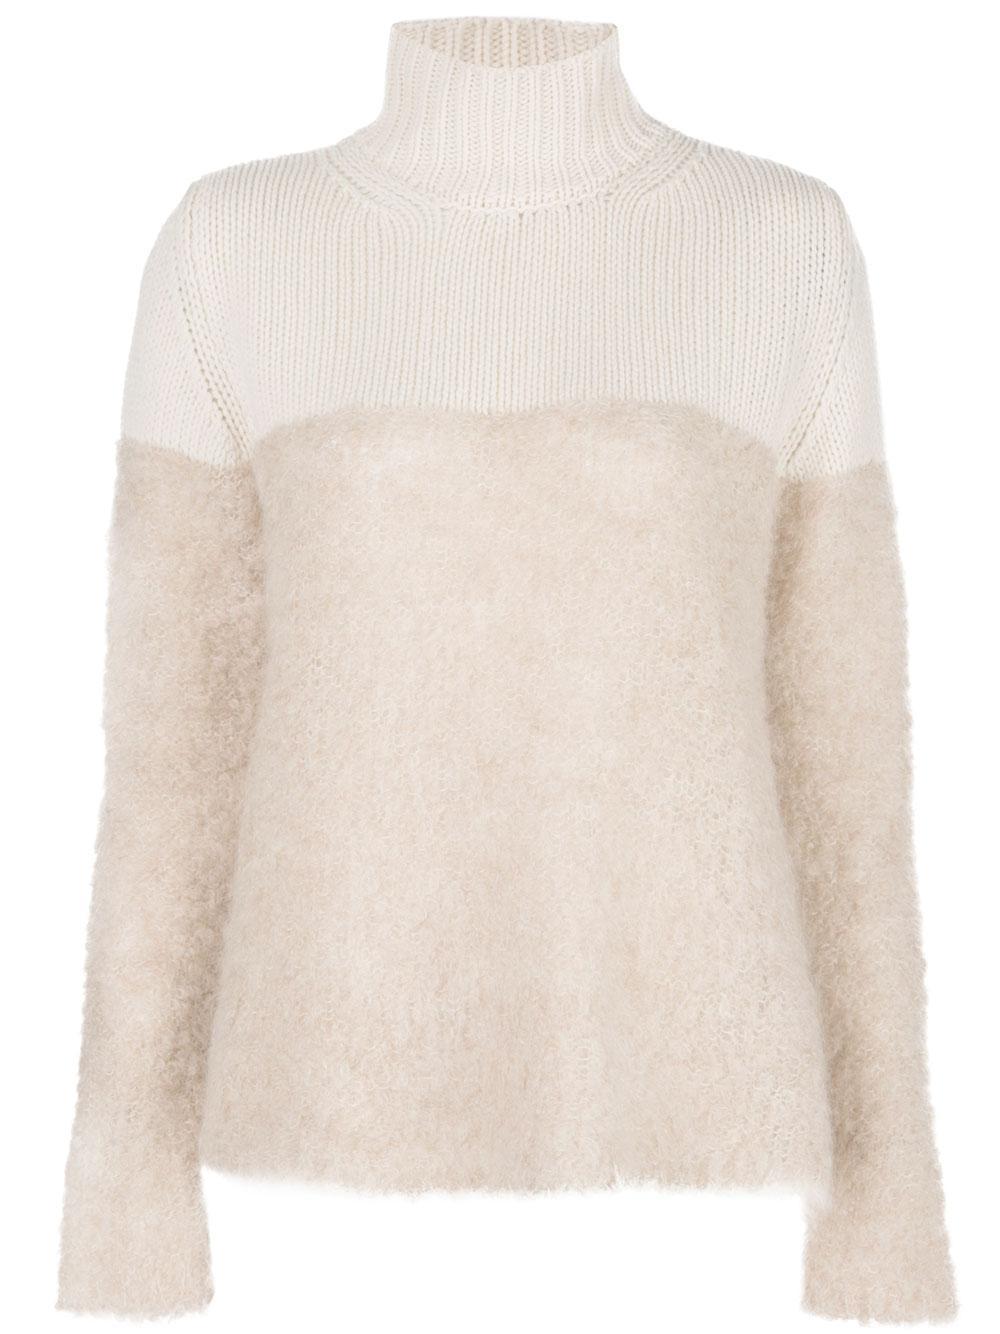 Cashmere Merino Wool Turtleneck Item # K057-FPU156